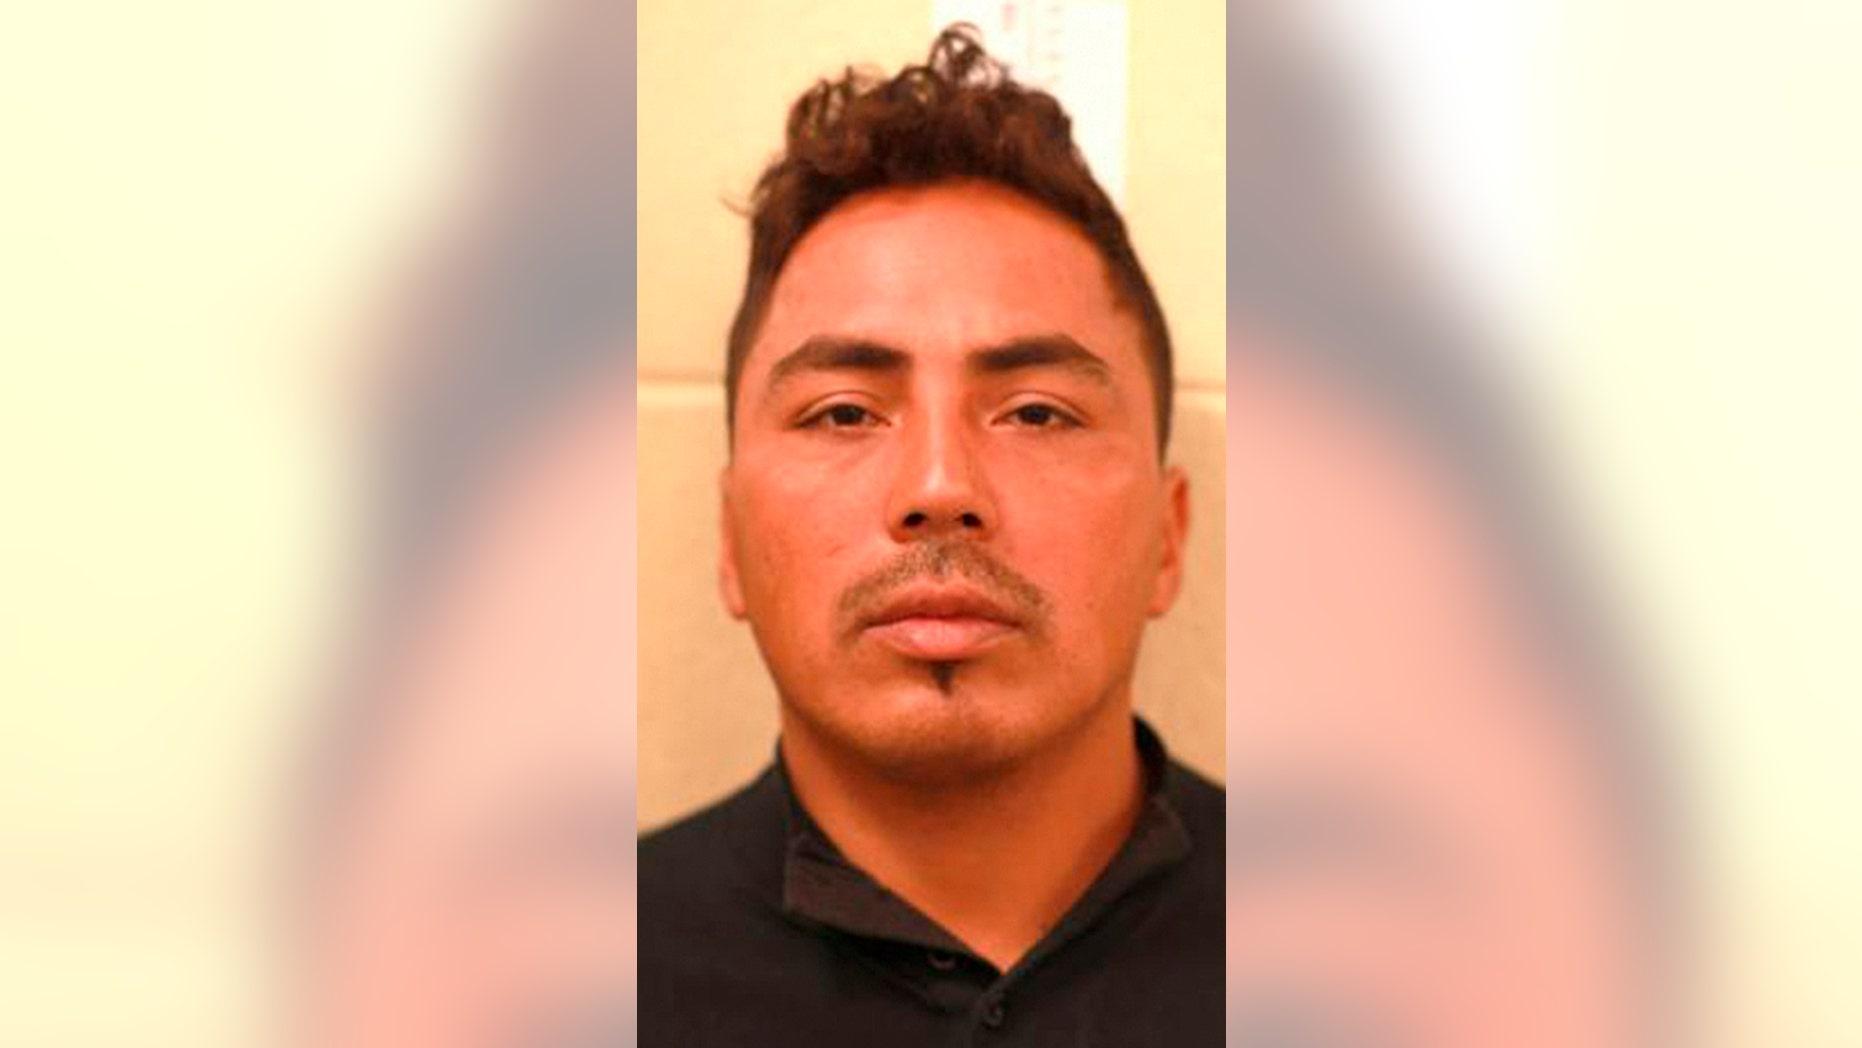 Jorge Antonio Avila-Rodas (U.S. Customs and Border Protection)